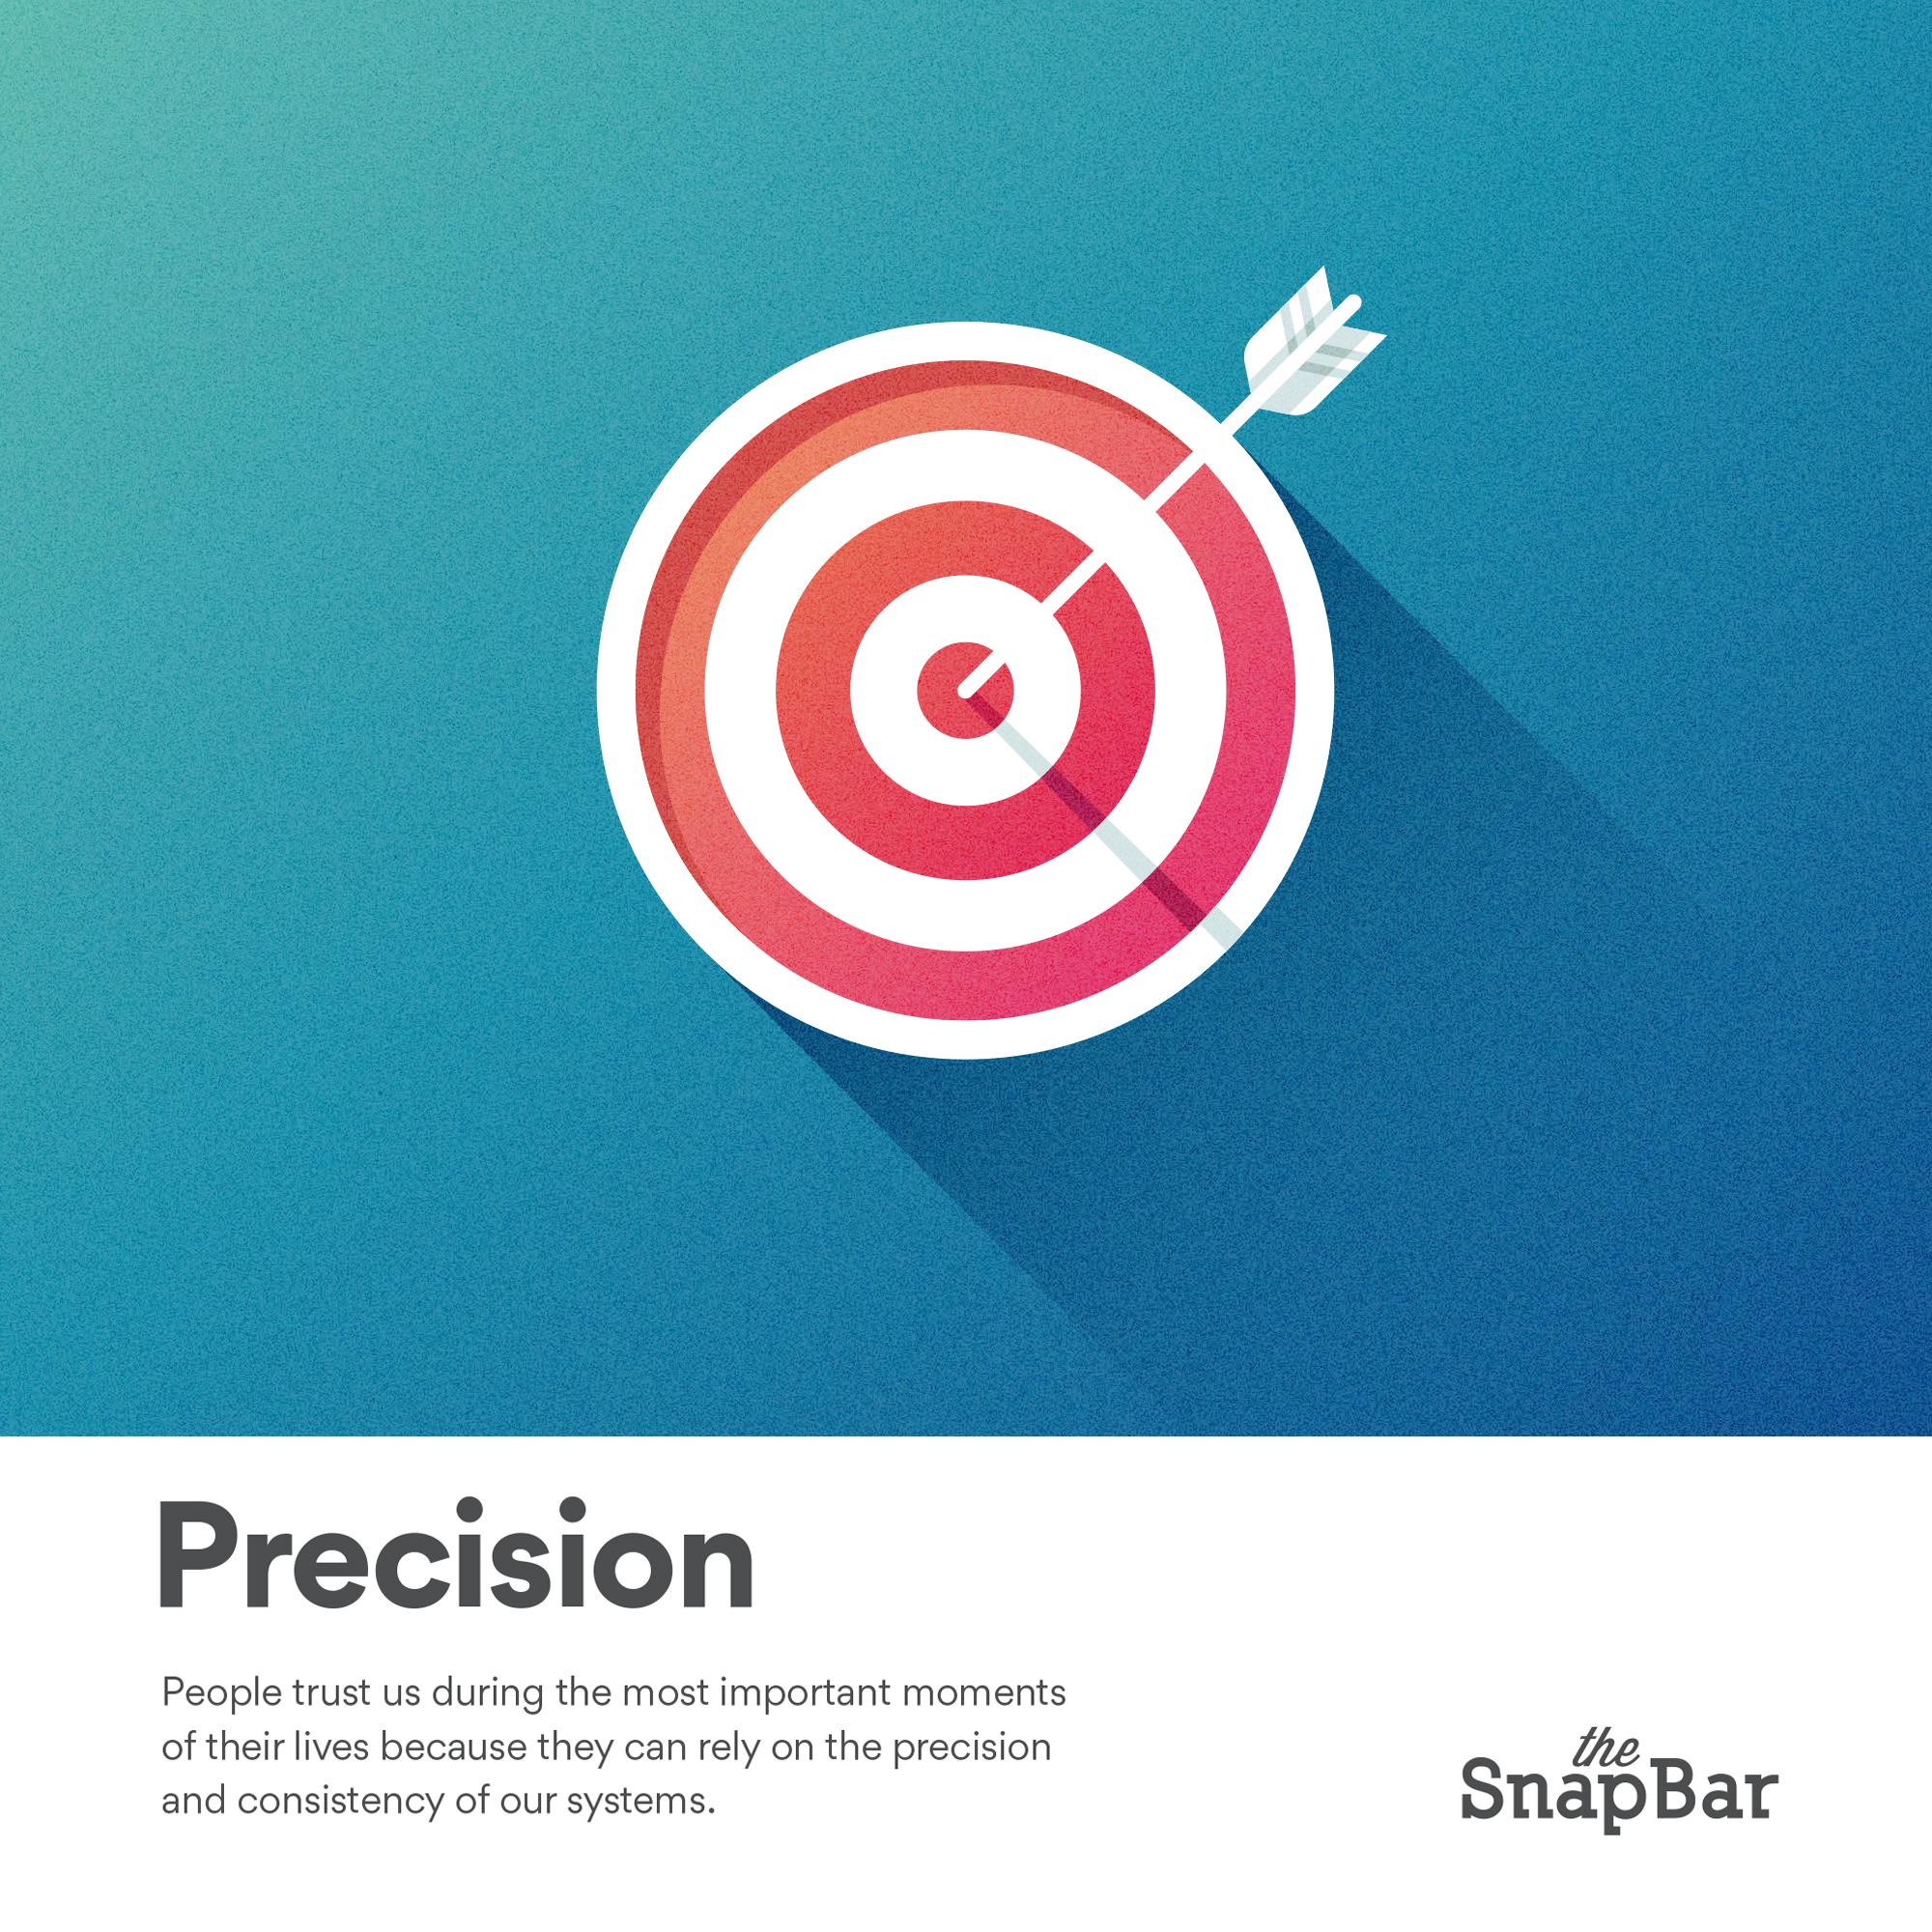 The SnapBar Core Values Precision